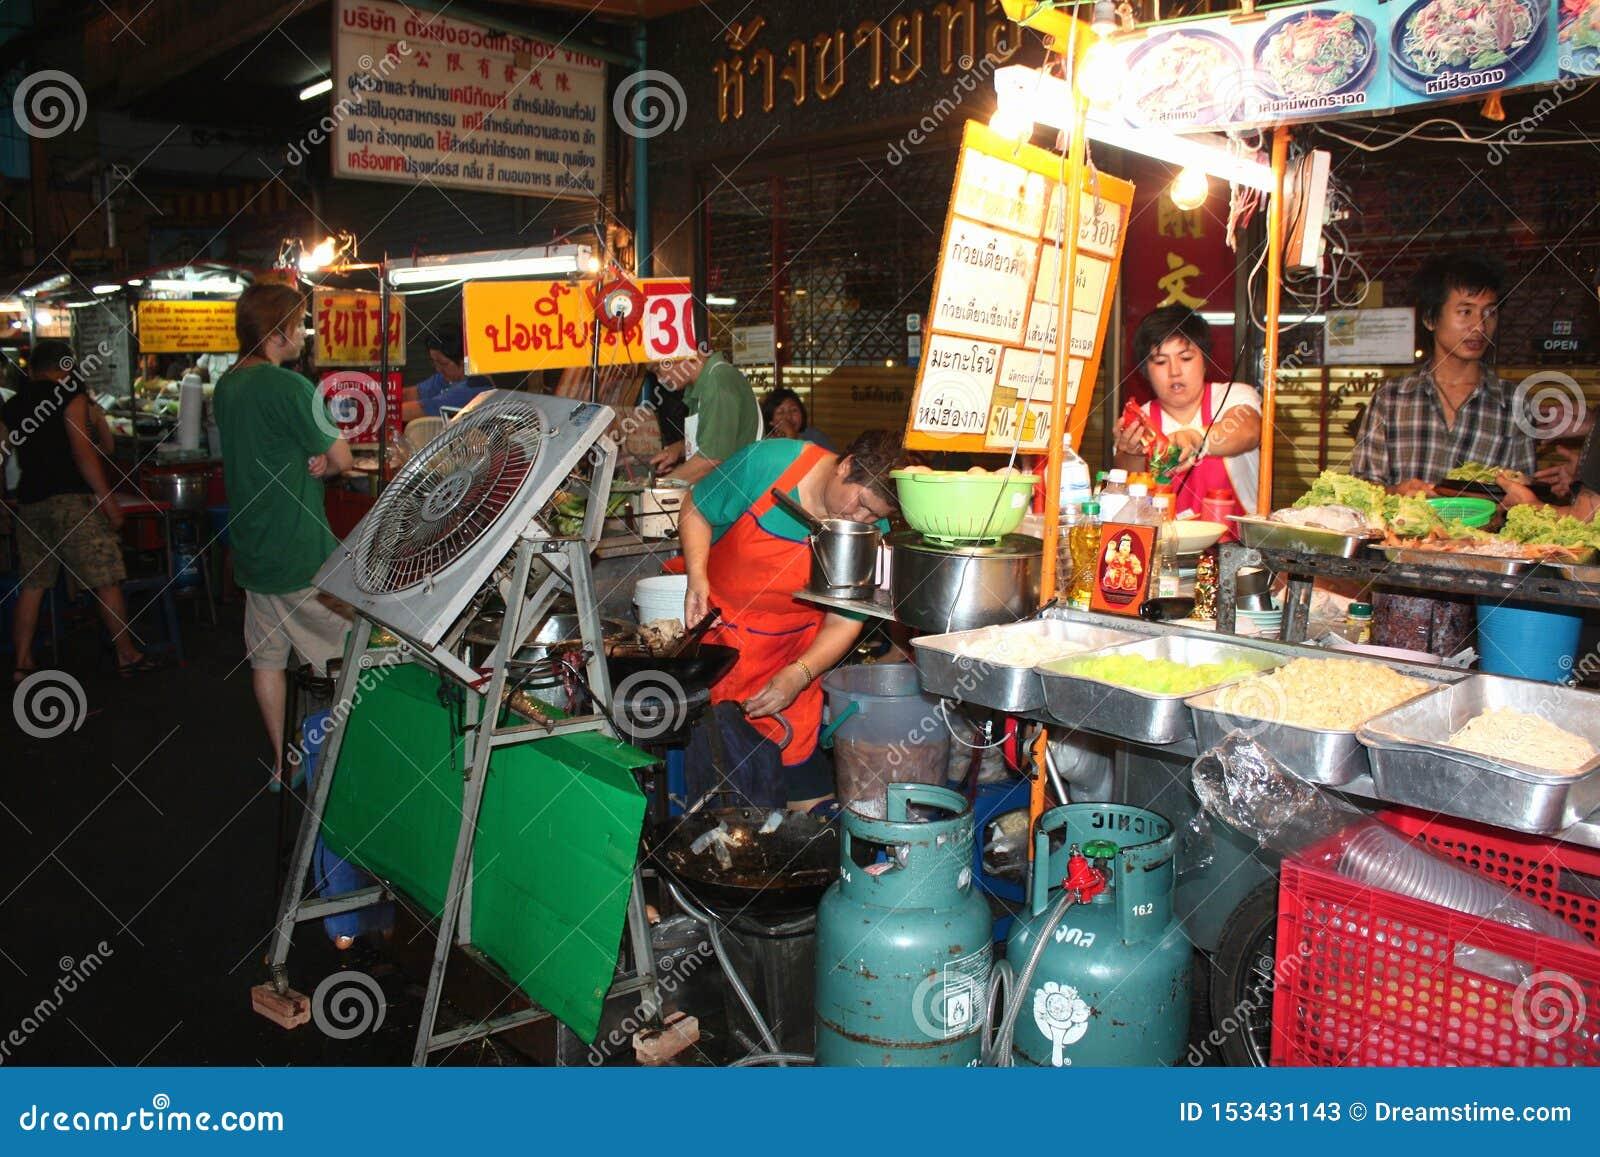 Bangkok Chinatown Street Food Night Mobile Kitchen Cafe Thai Food Editorial Stock Photo Image Of Market Cafe 153431143